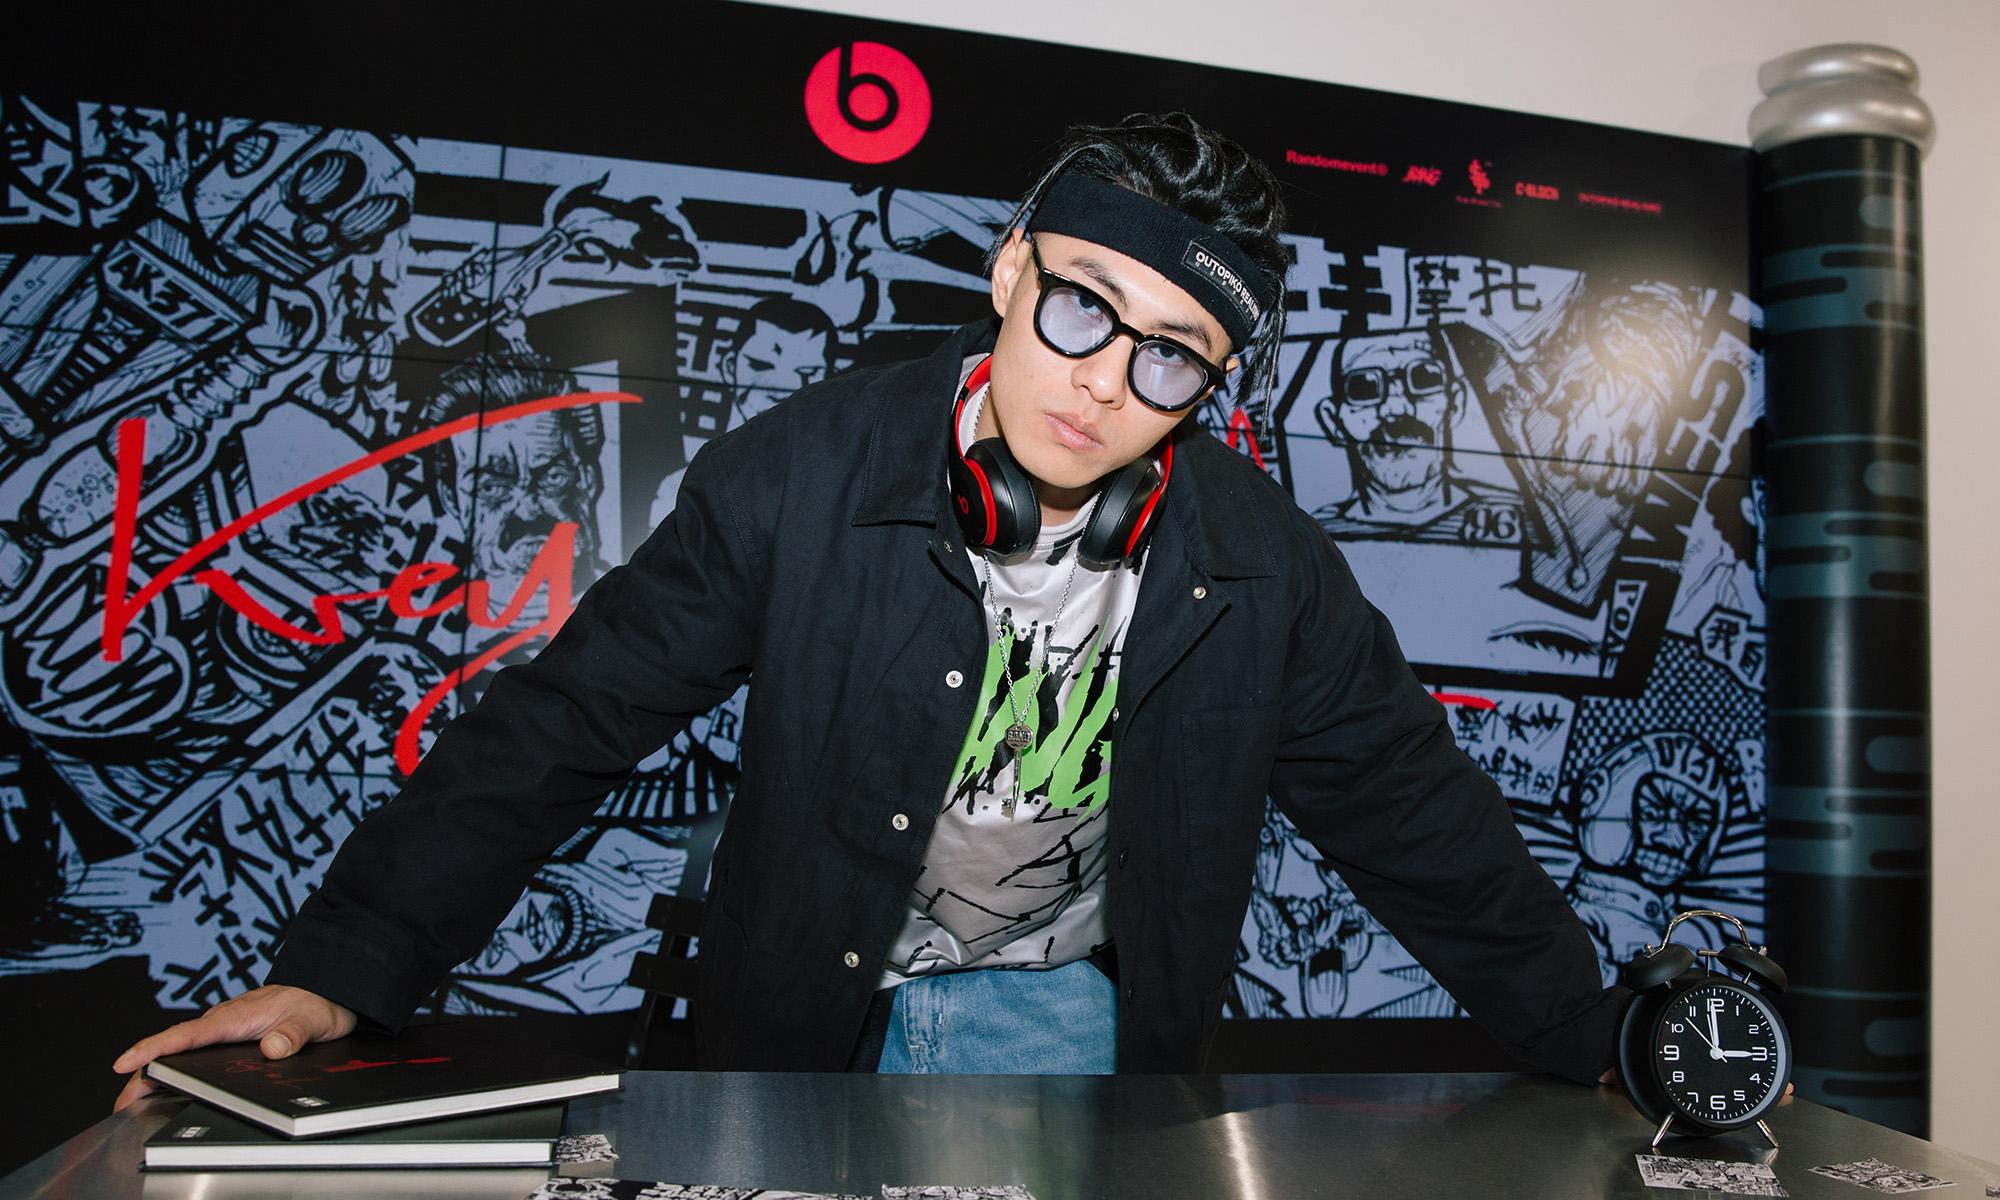 Beats 与 Randomevent 联合呈现刘聪新专辑签售活动